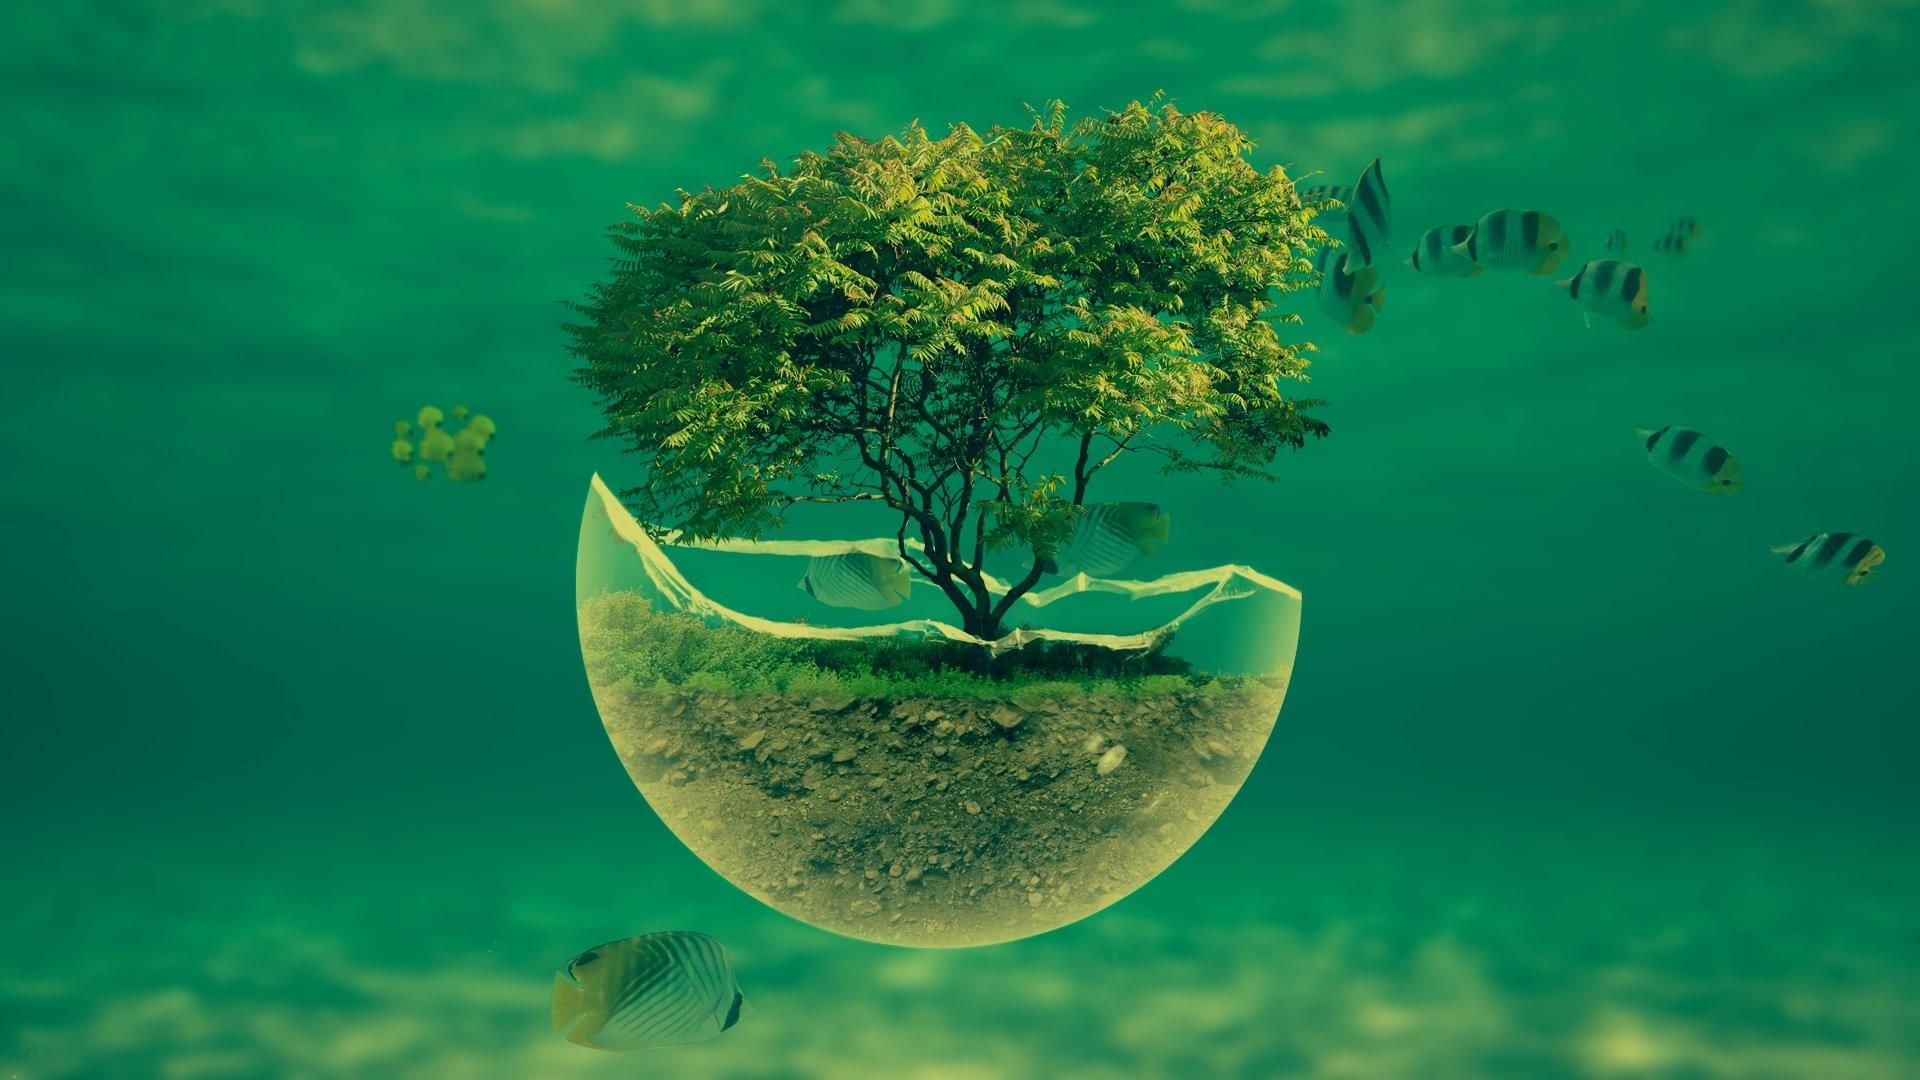 … 1188_3d_abstract 1920×1080-underwater-tree-widescreen-hd-abstract -desktop-wallpaper …